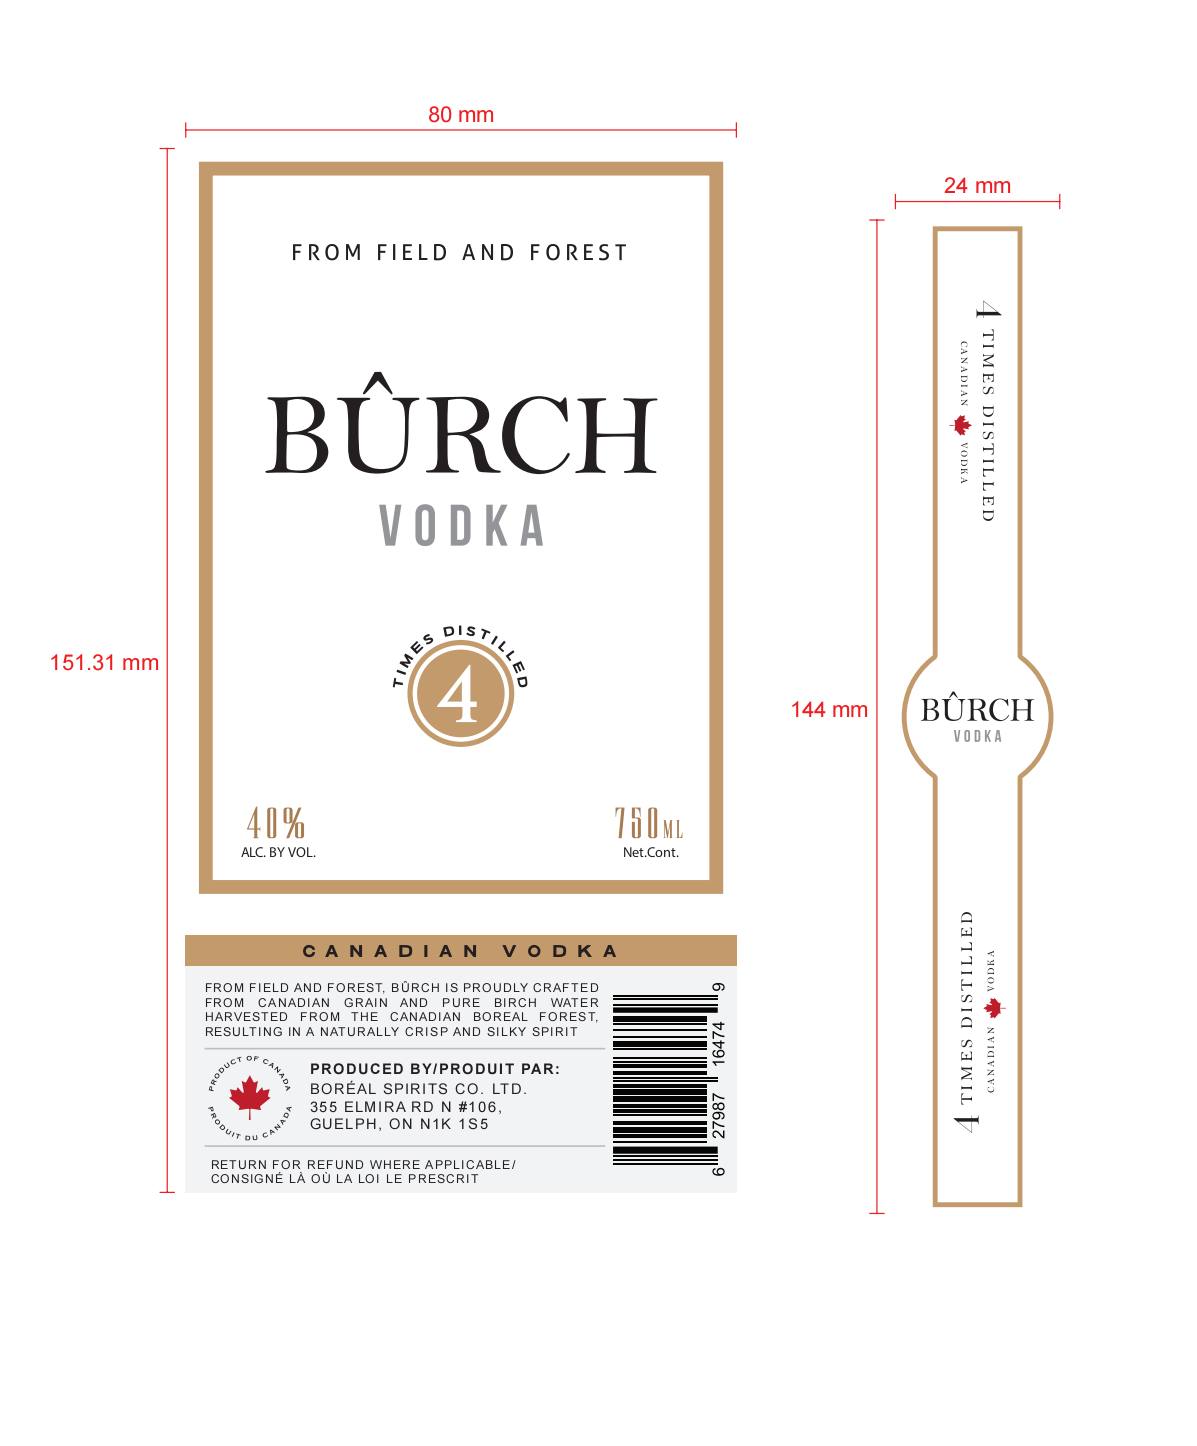 regulatory changes to burch vodka